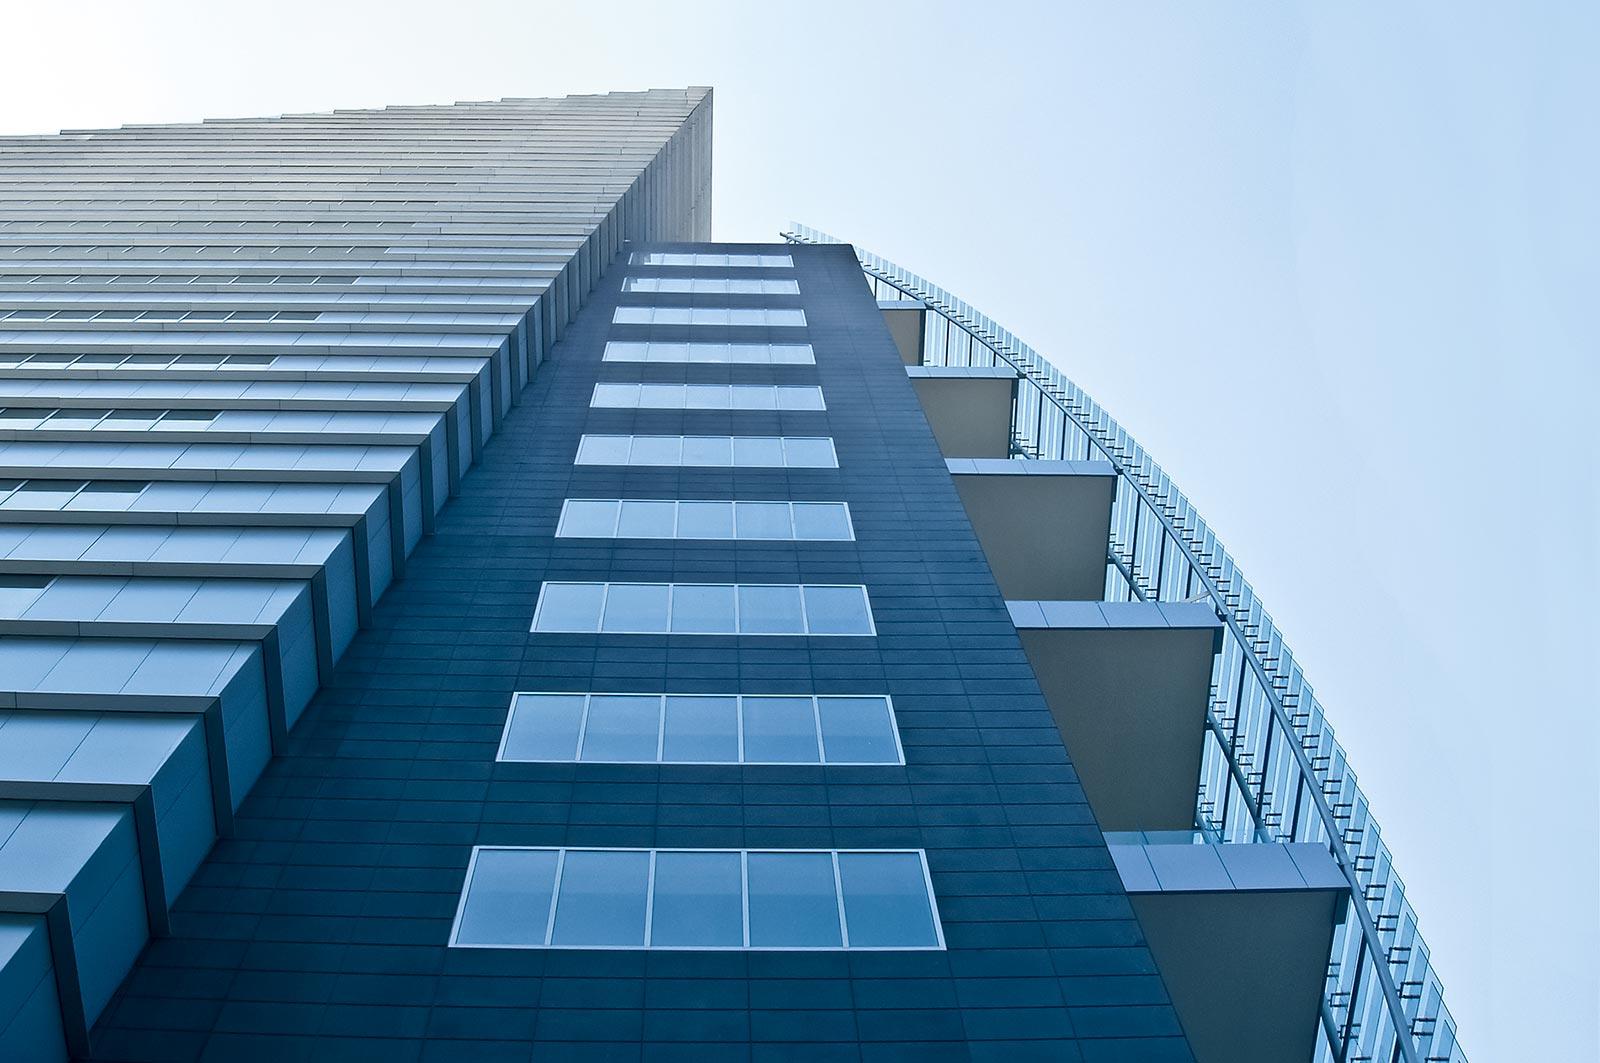 Telefonica Movistar Corporate Building, 2004